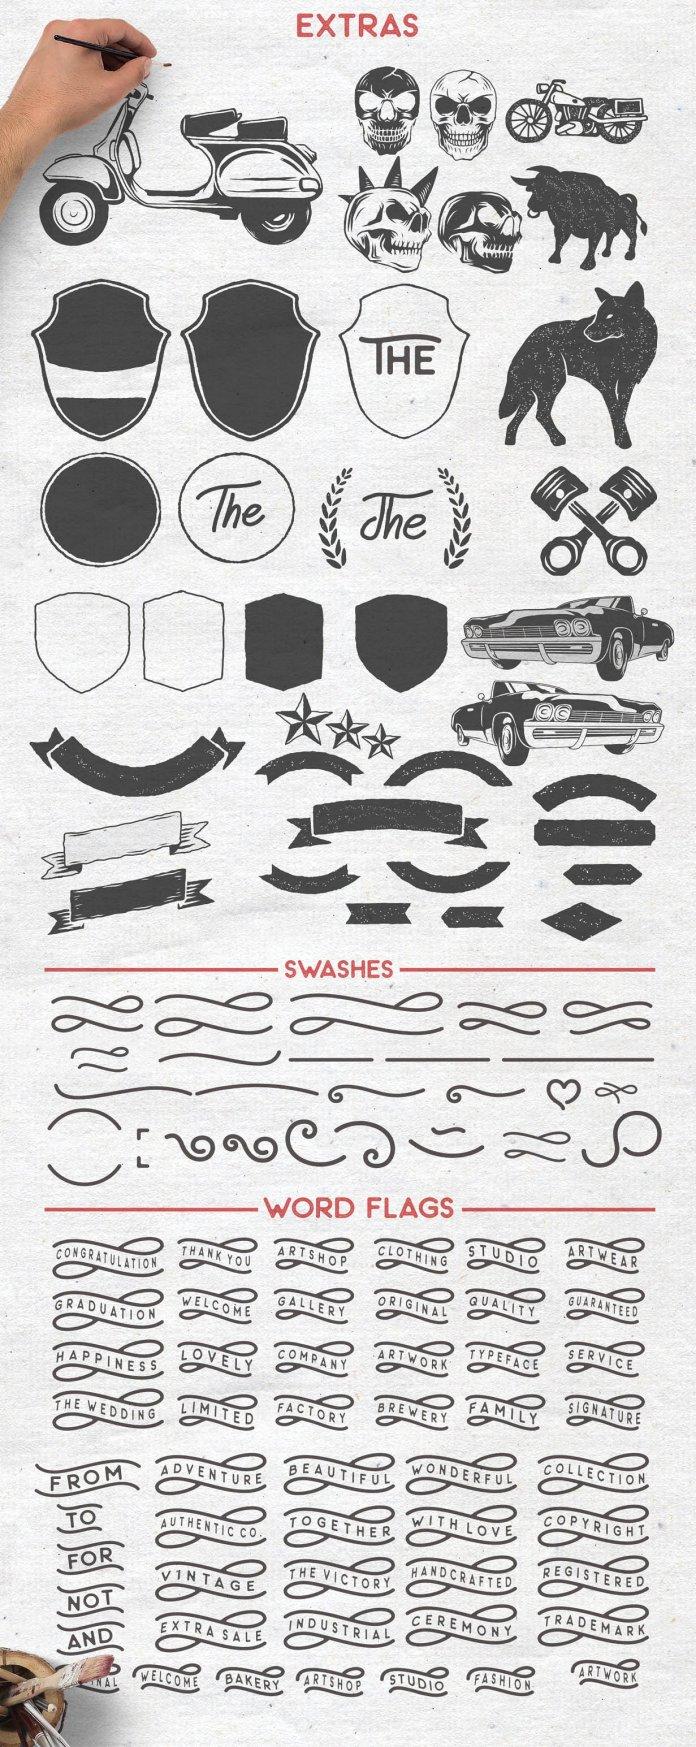 The Artland Typeface